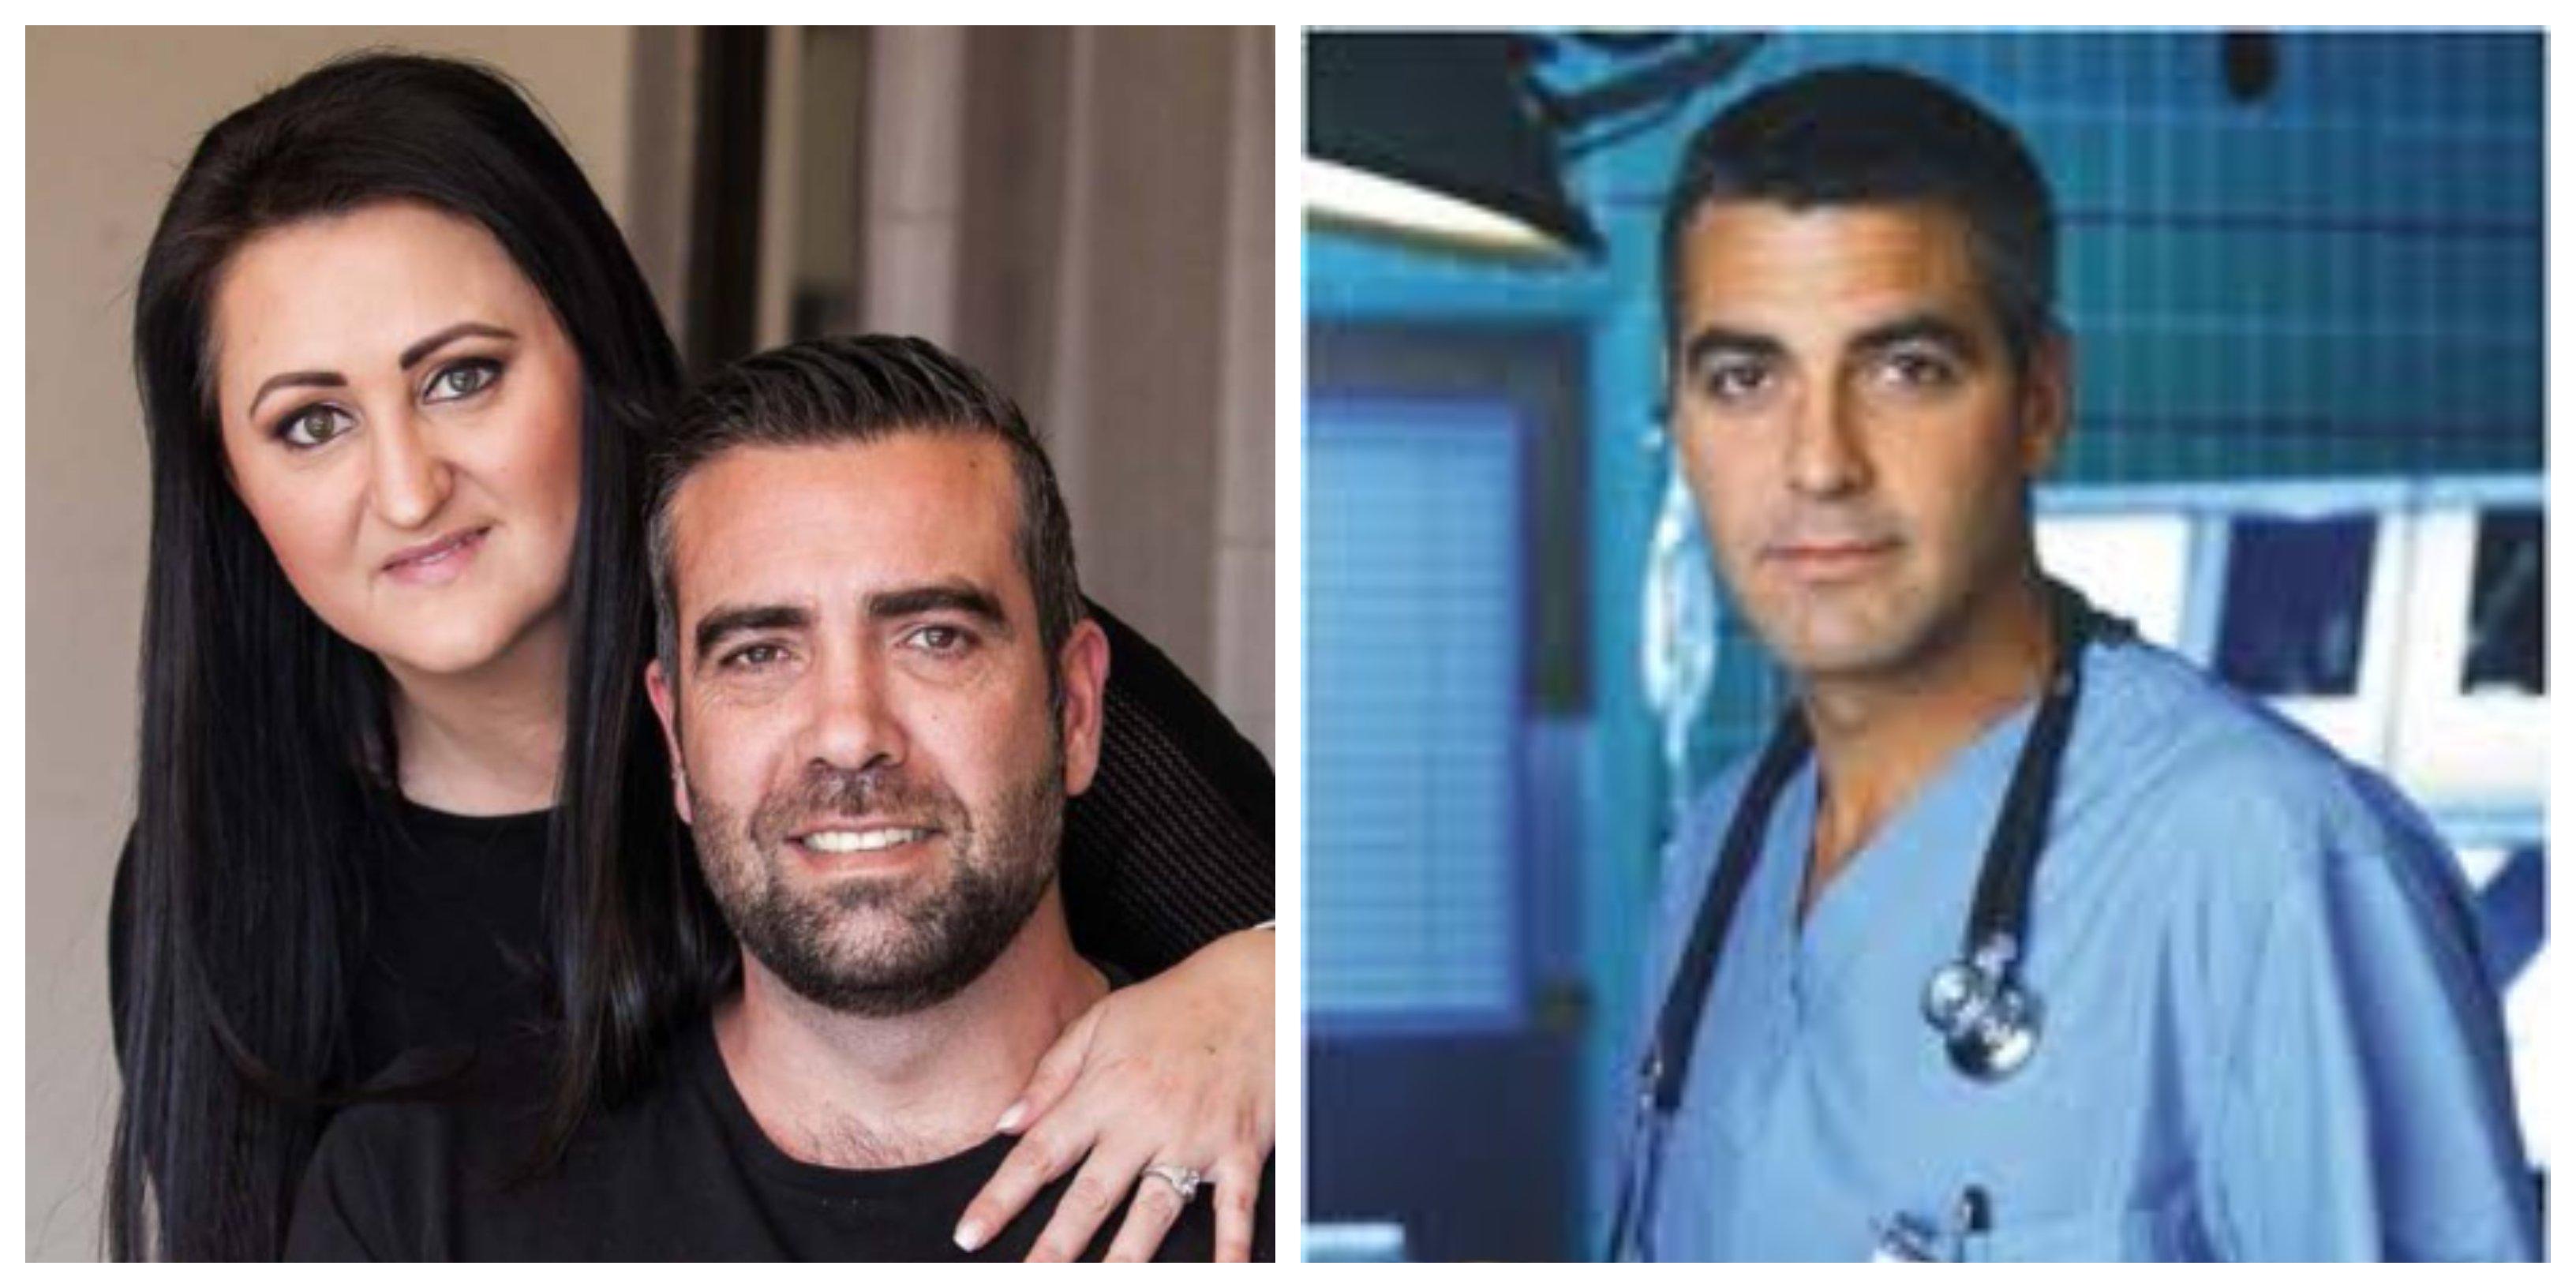 Jo Black / George Clooney 2